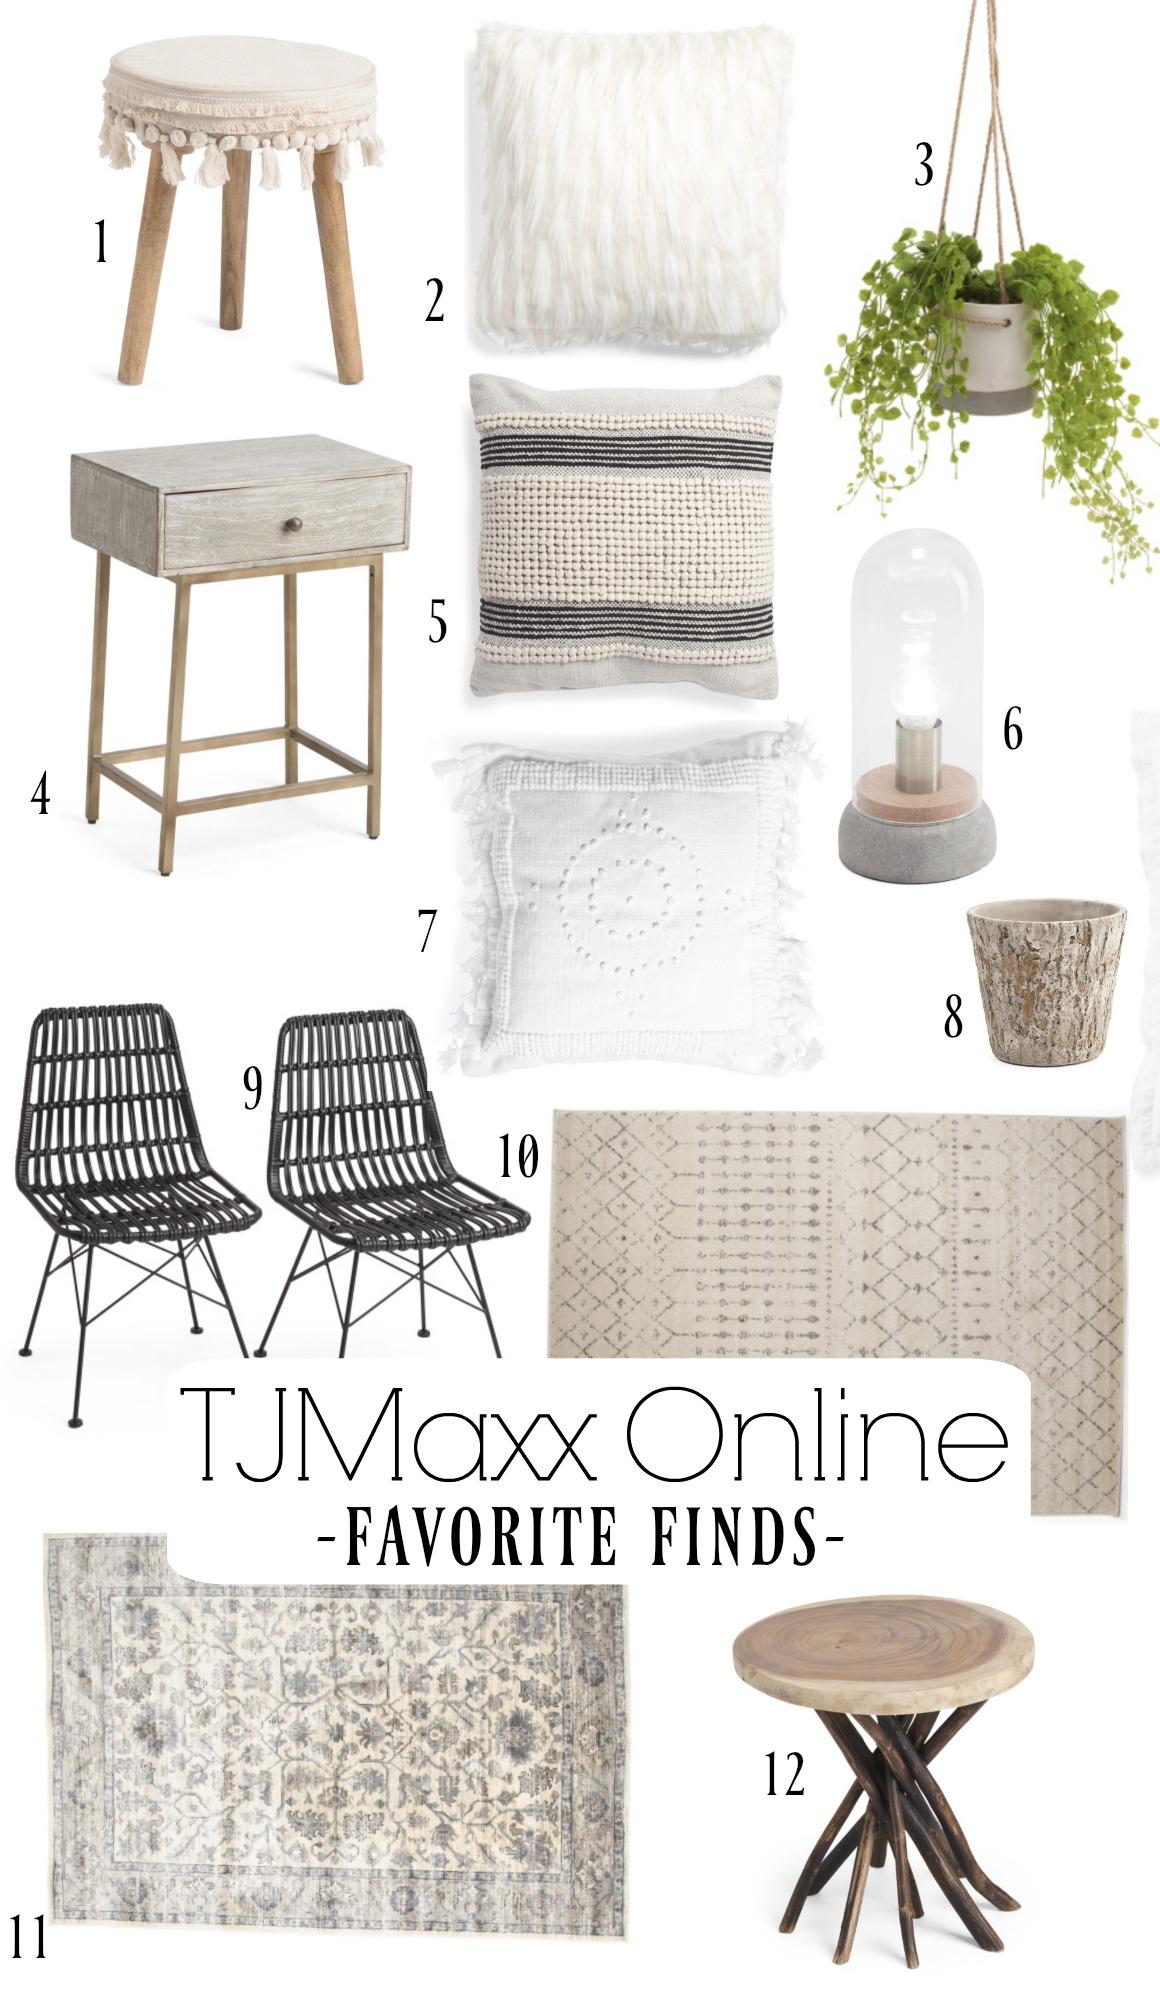 TJMaxx Online Favorite Finds